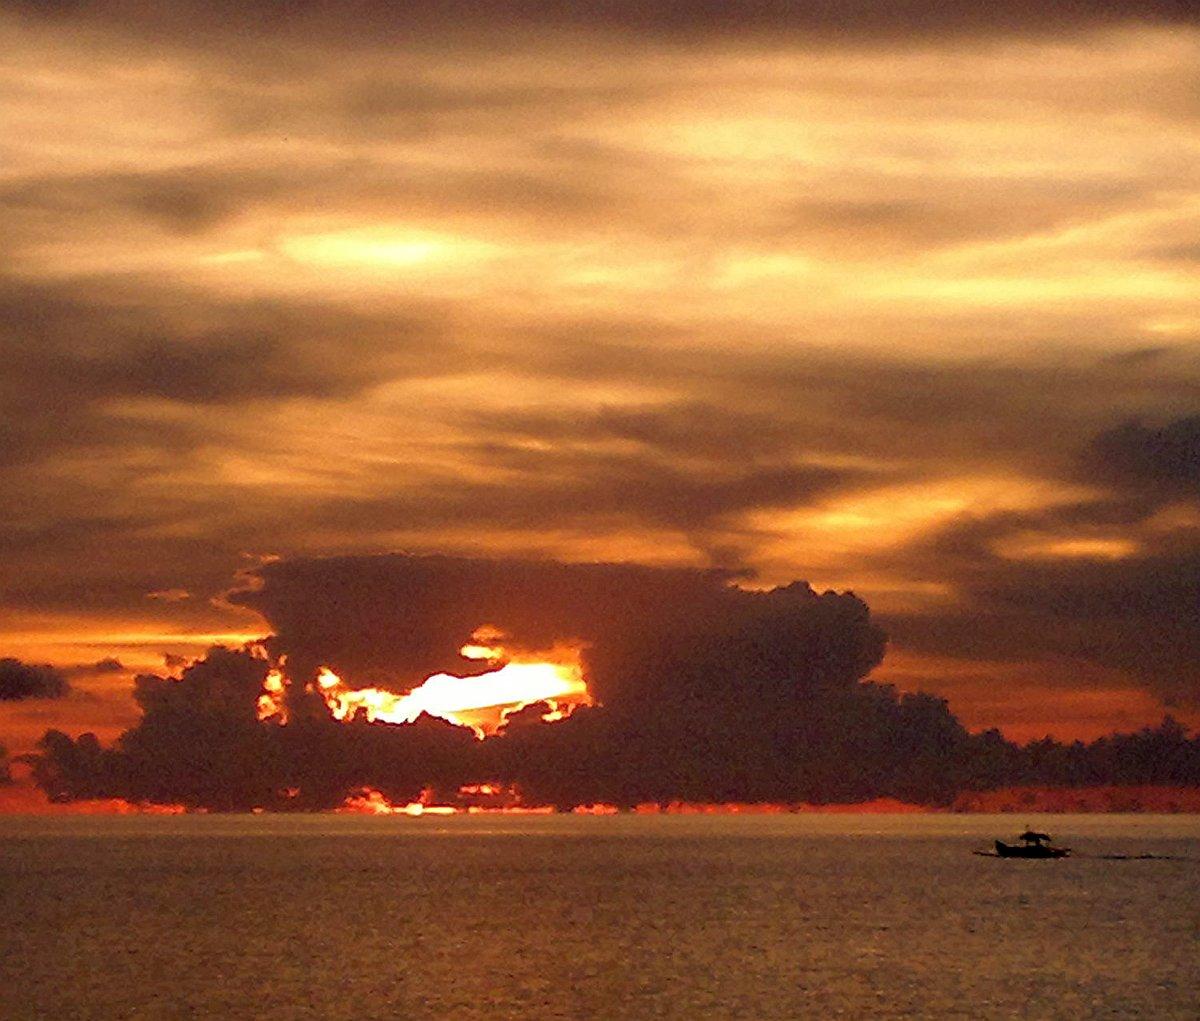 patoyo-linapacan-philippines-sunrises-and-sunsets-300720152981